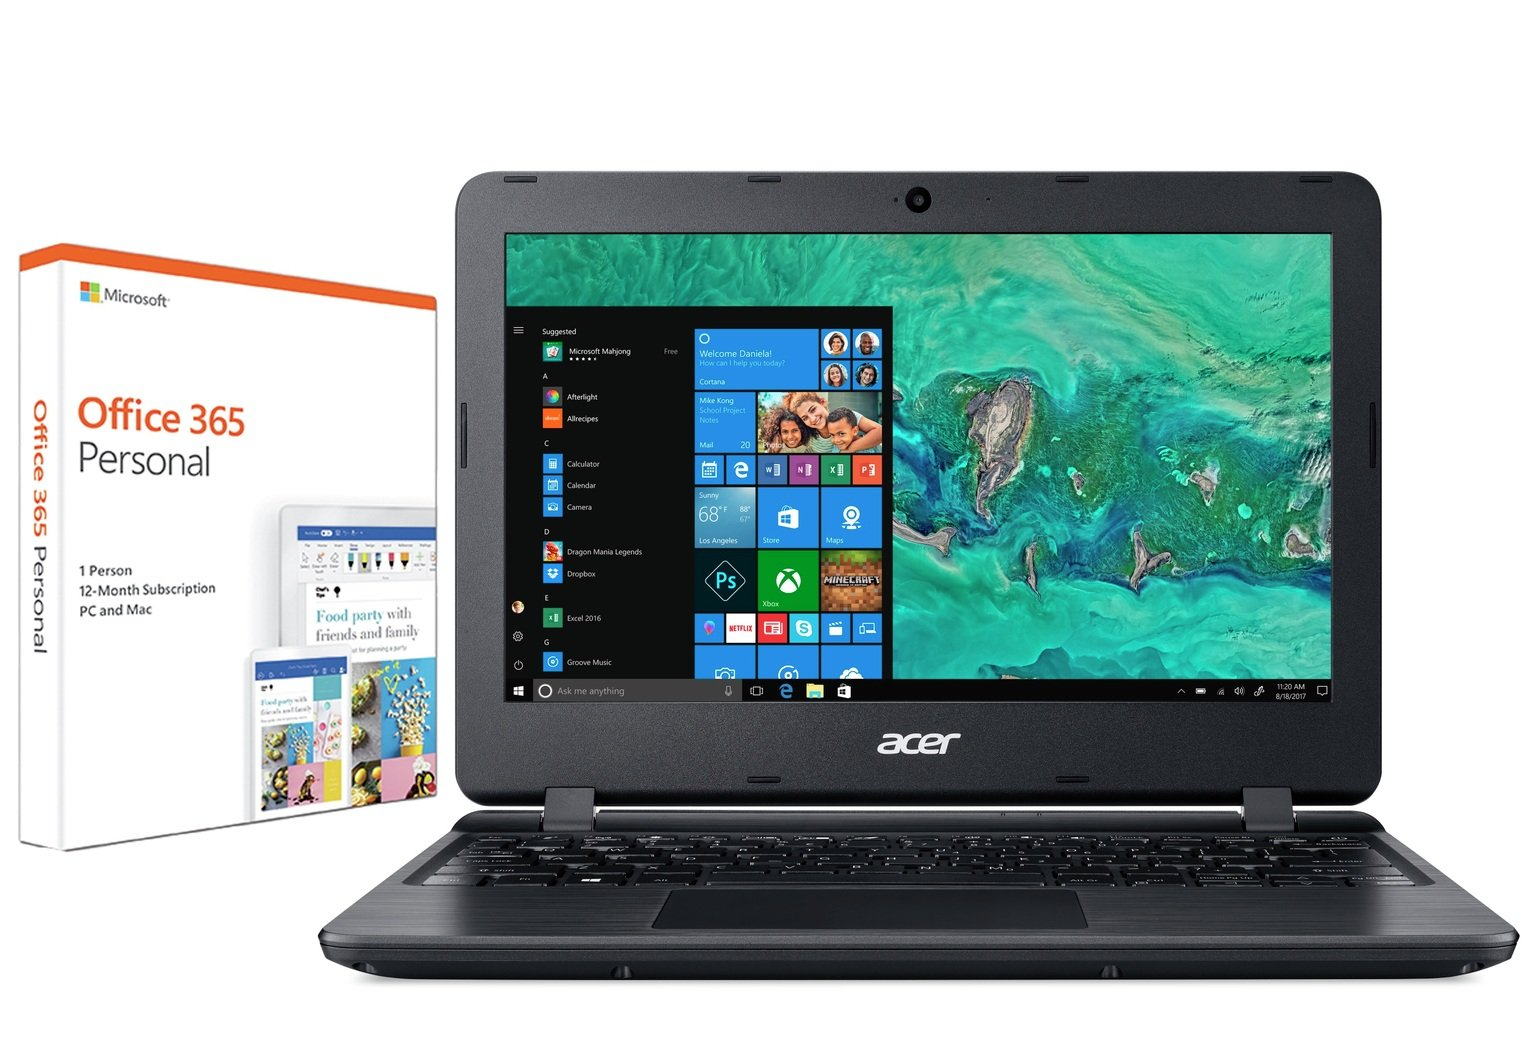 Acer Aspire 1 11In Celeron 2GB 32GB Cloudbook Laptop - Black